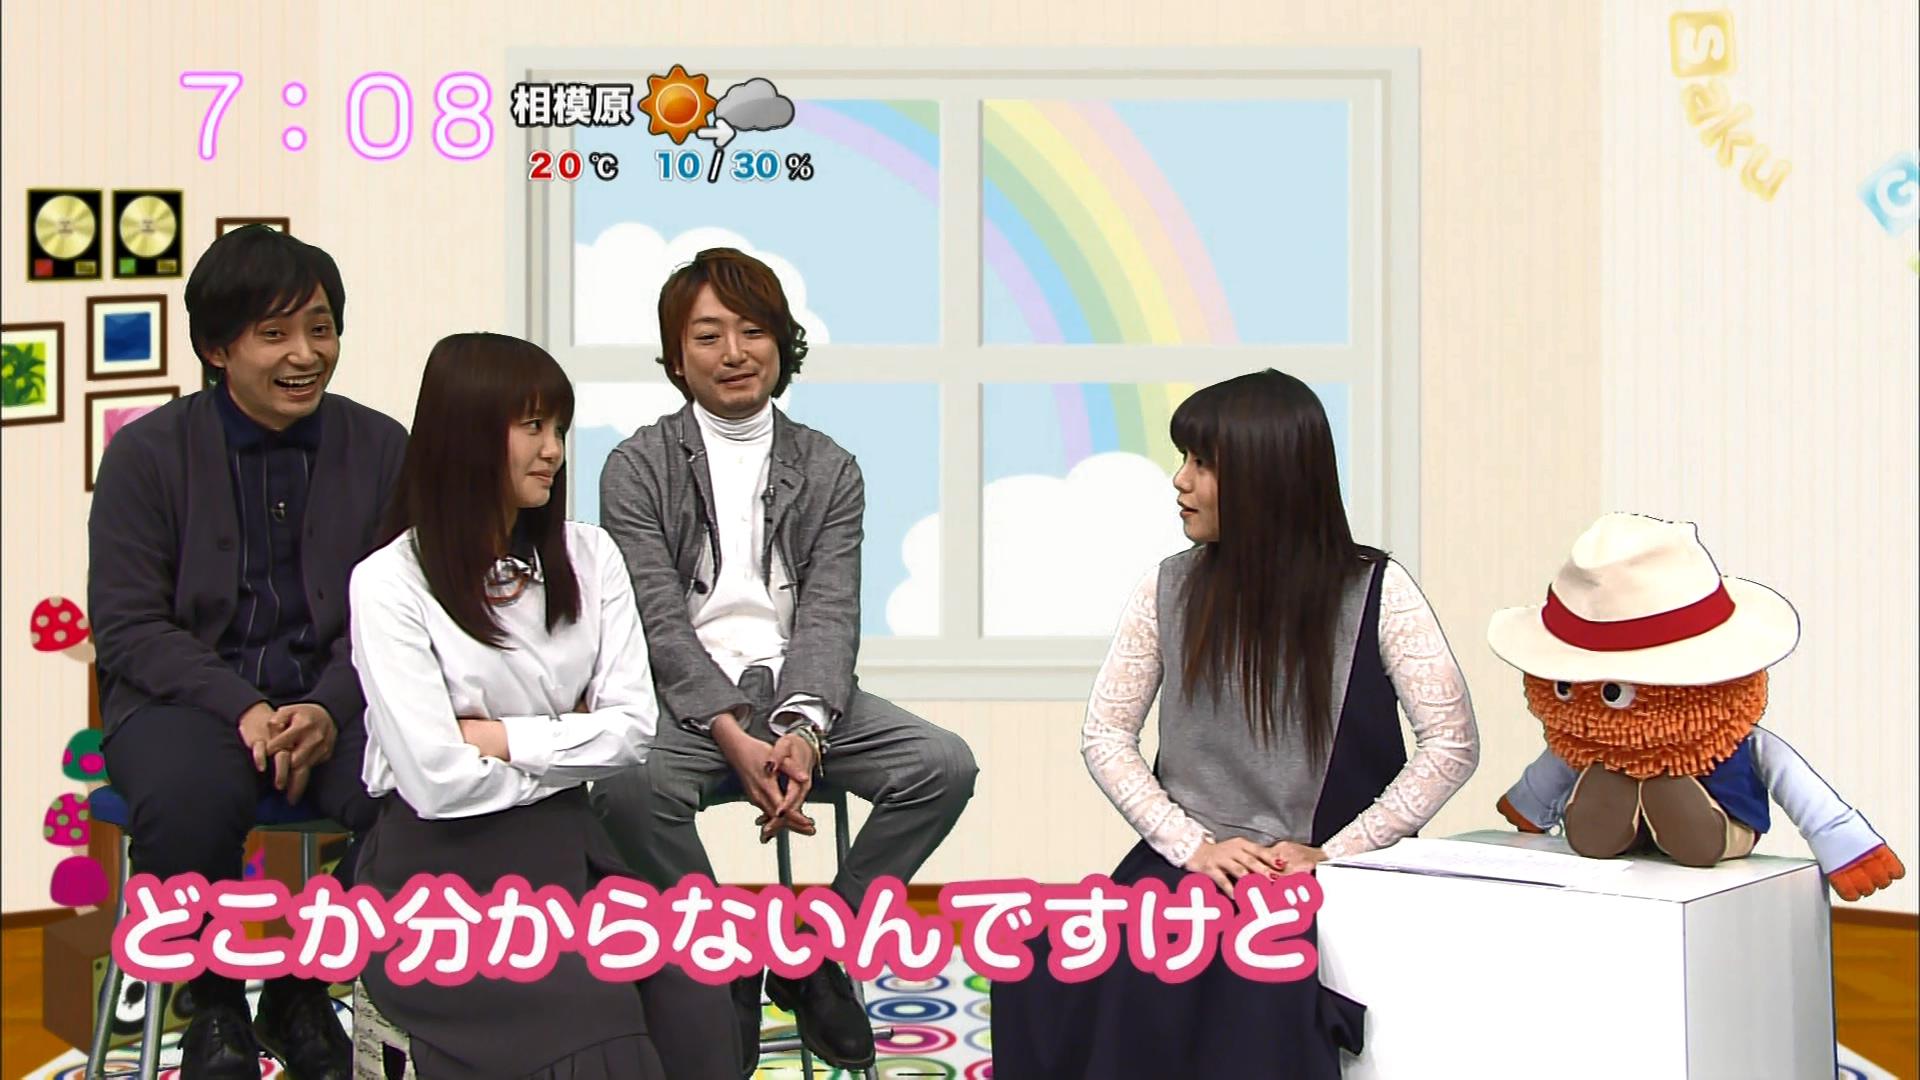 2016.03.18 いきものがかり(saku saku).ts_20160318_102116.291